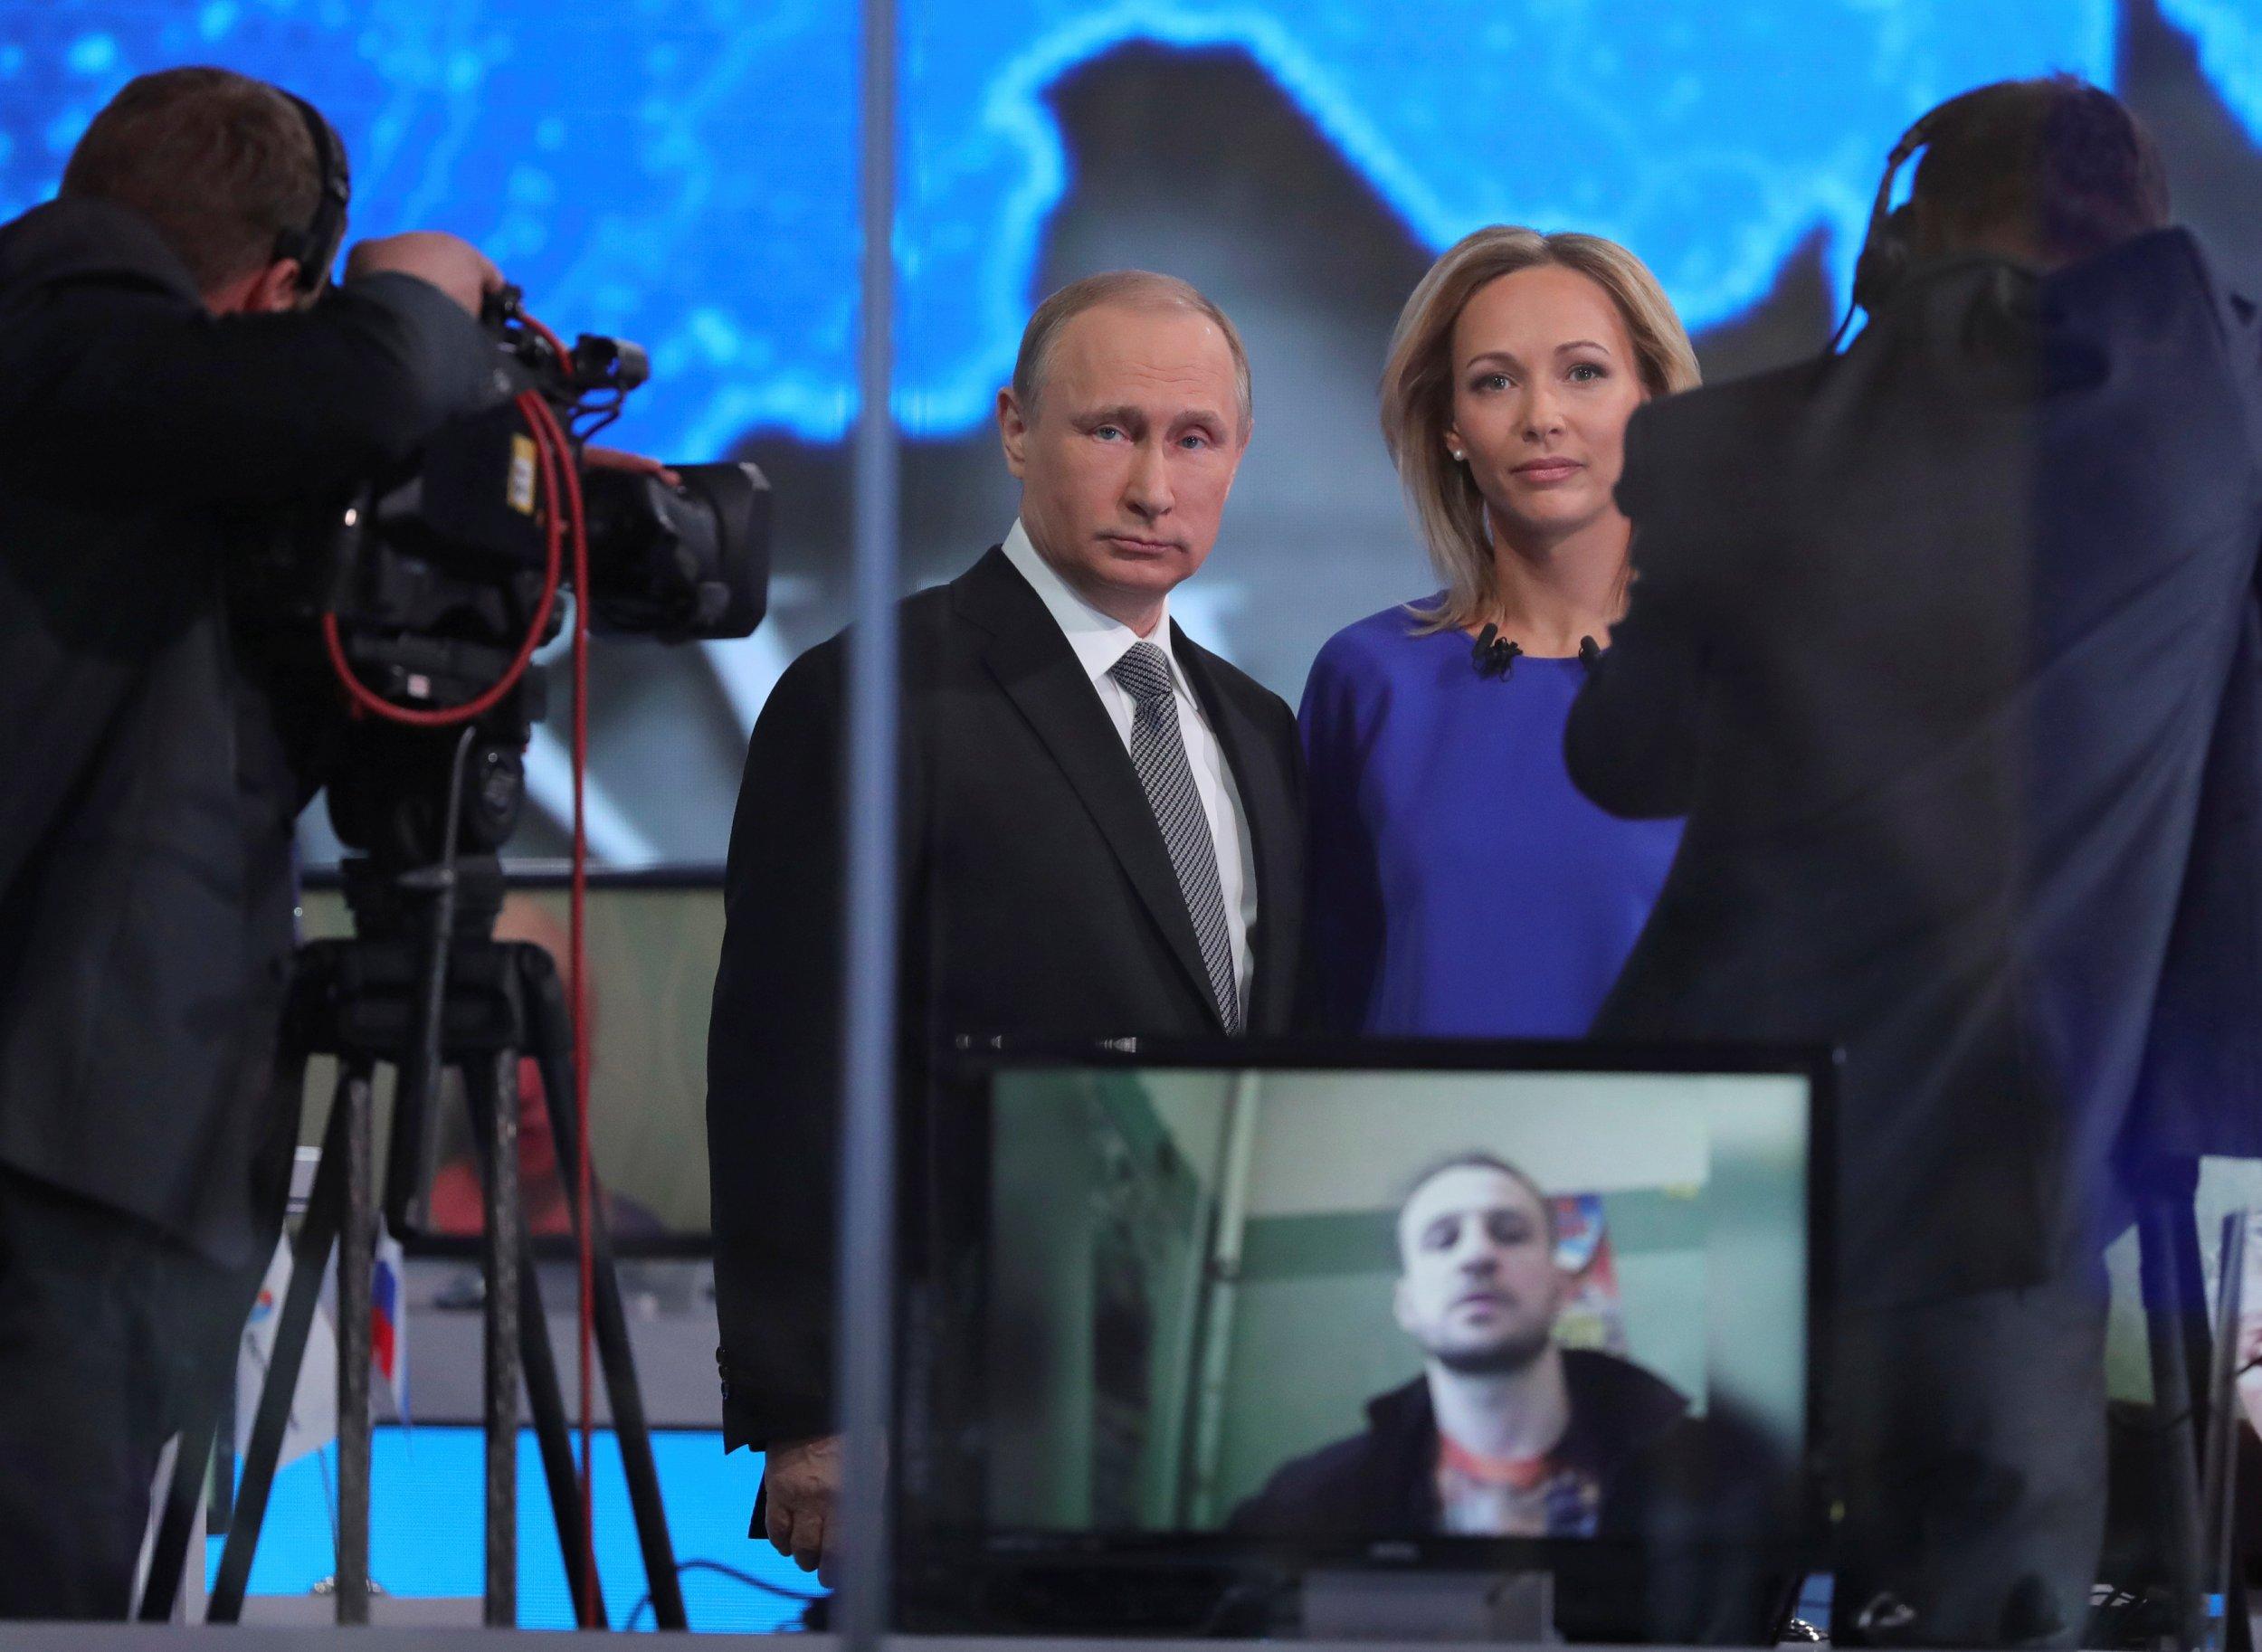 Putin direct line